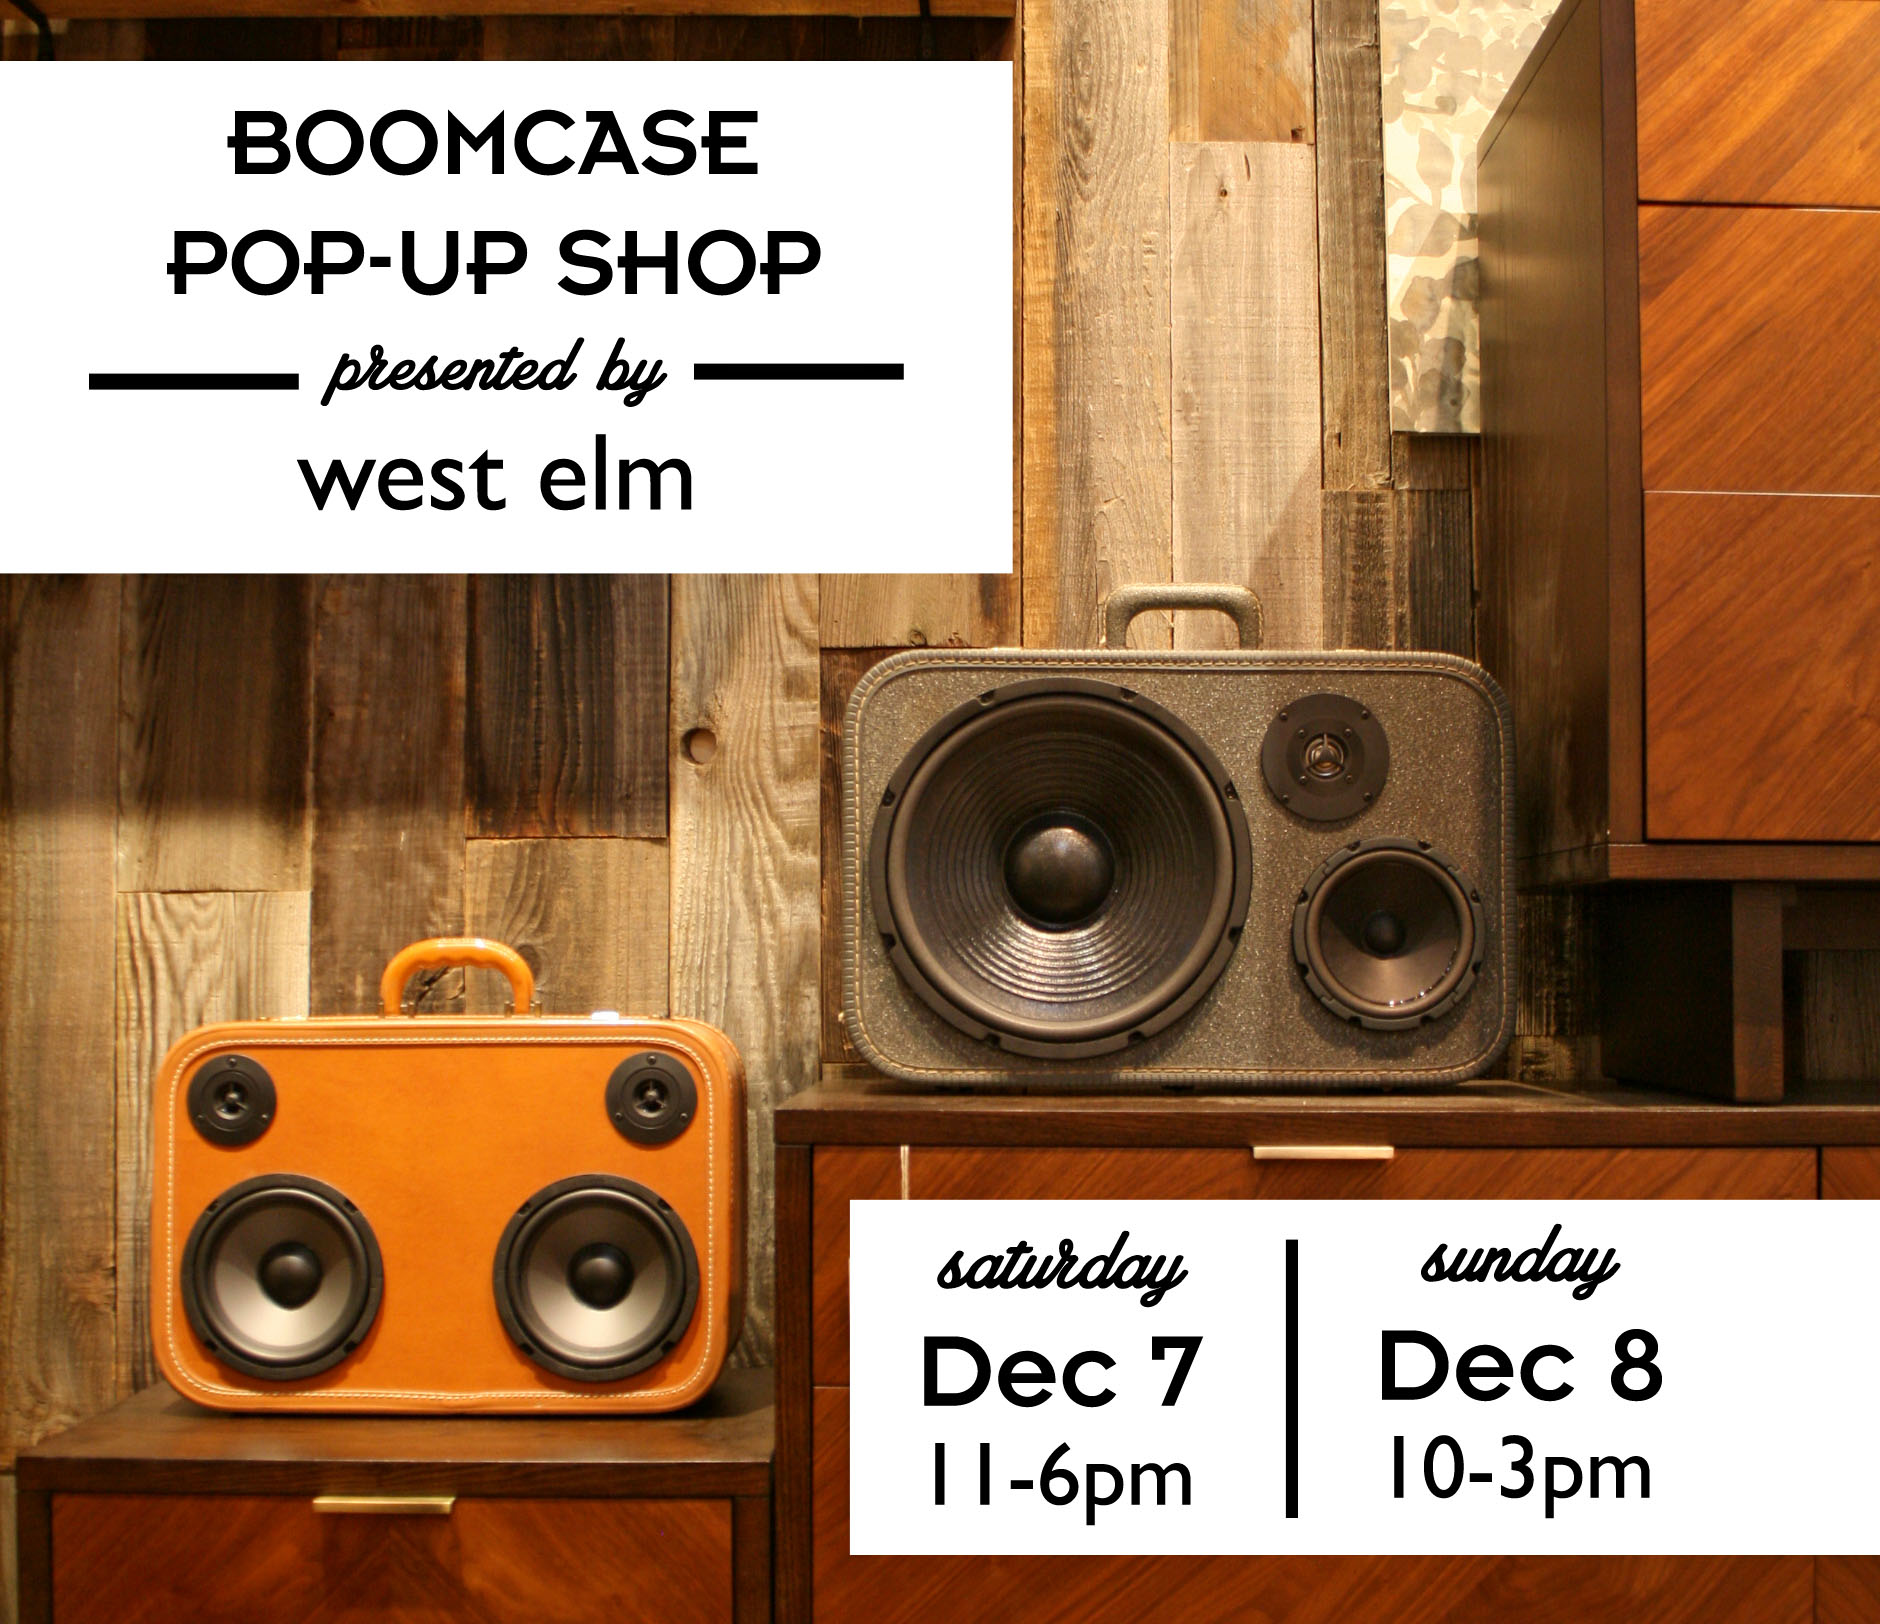 West elm x boomcase store